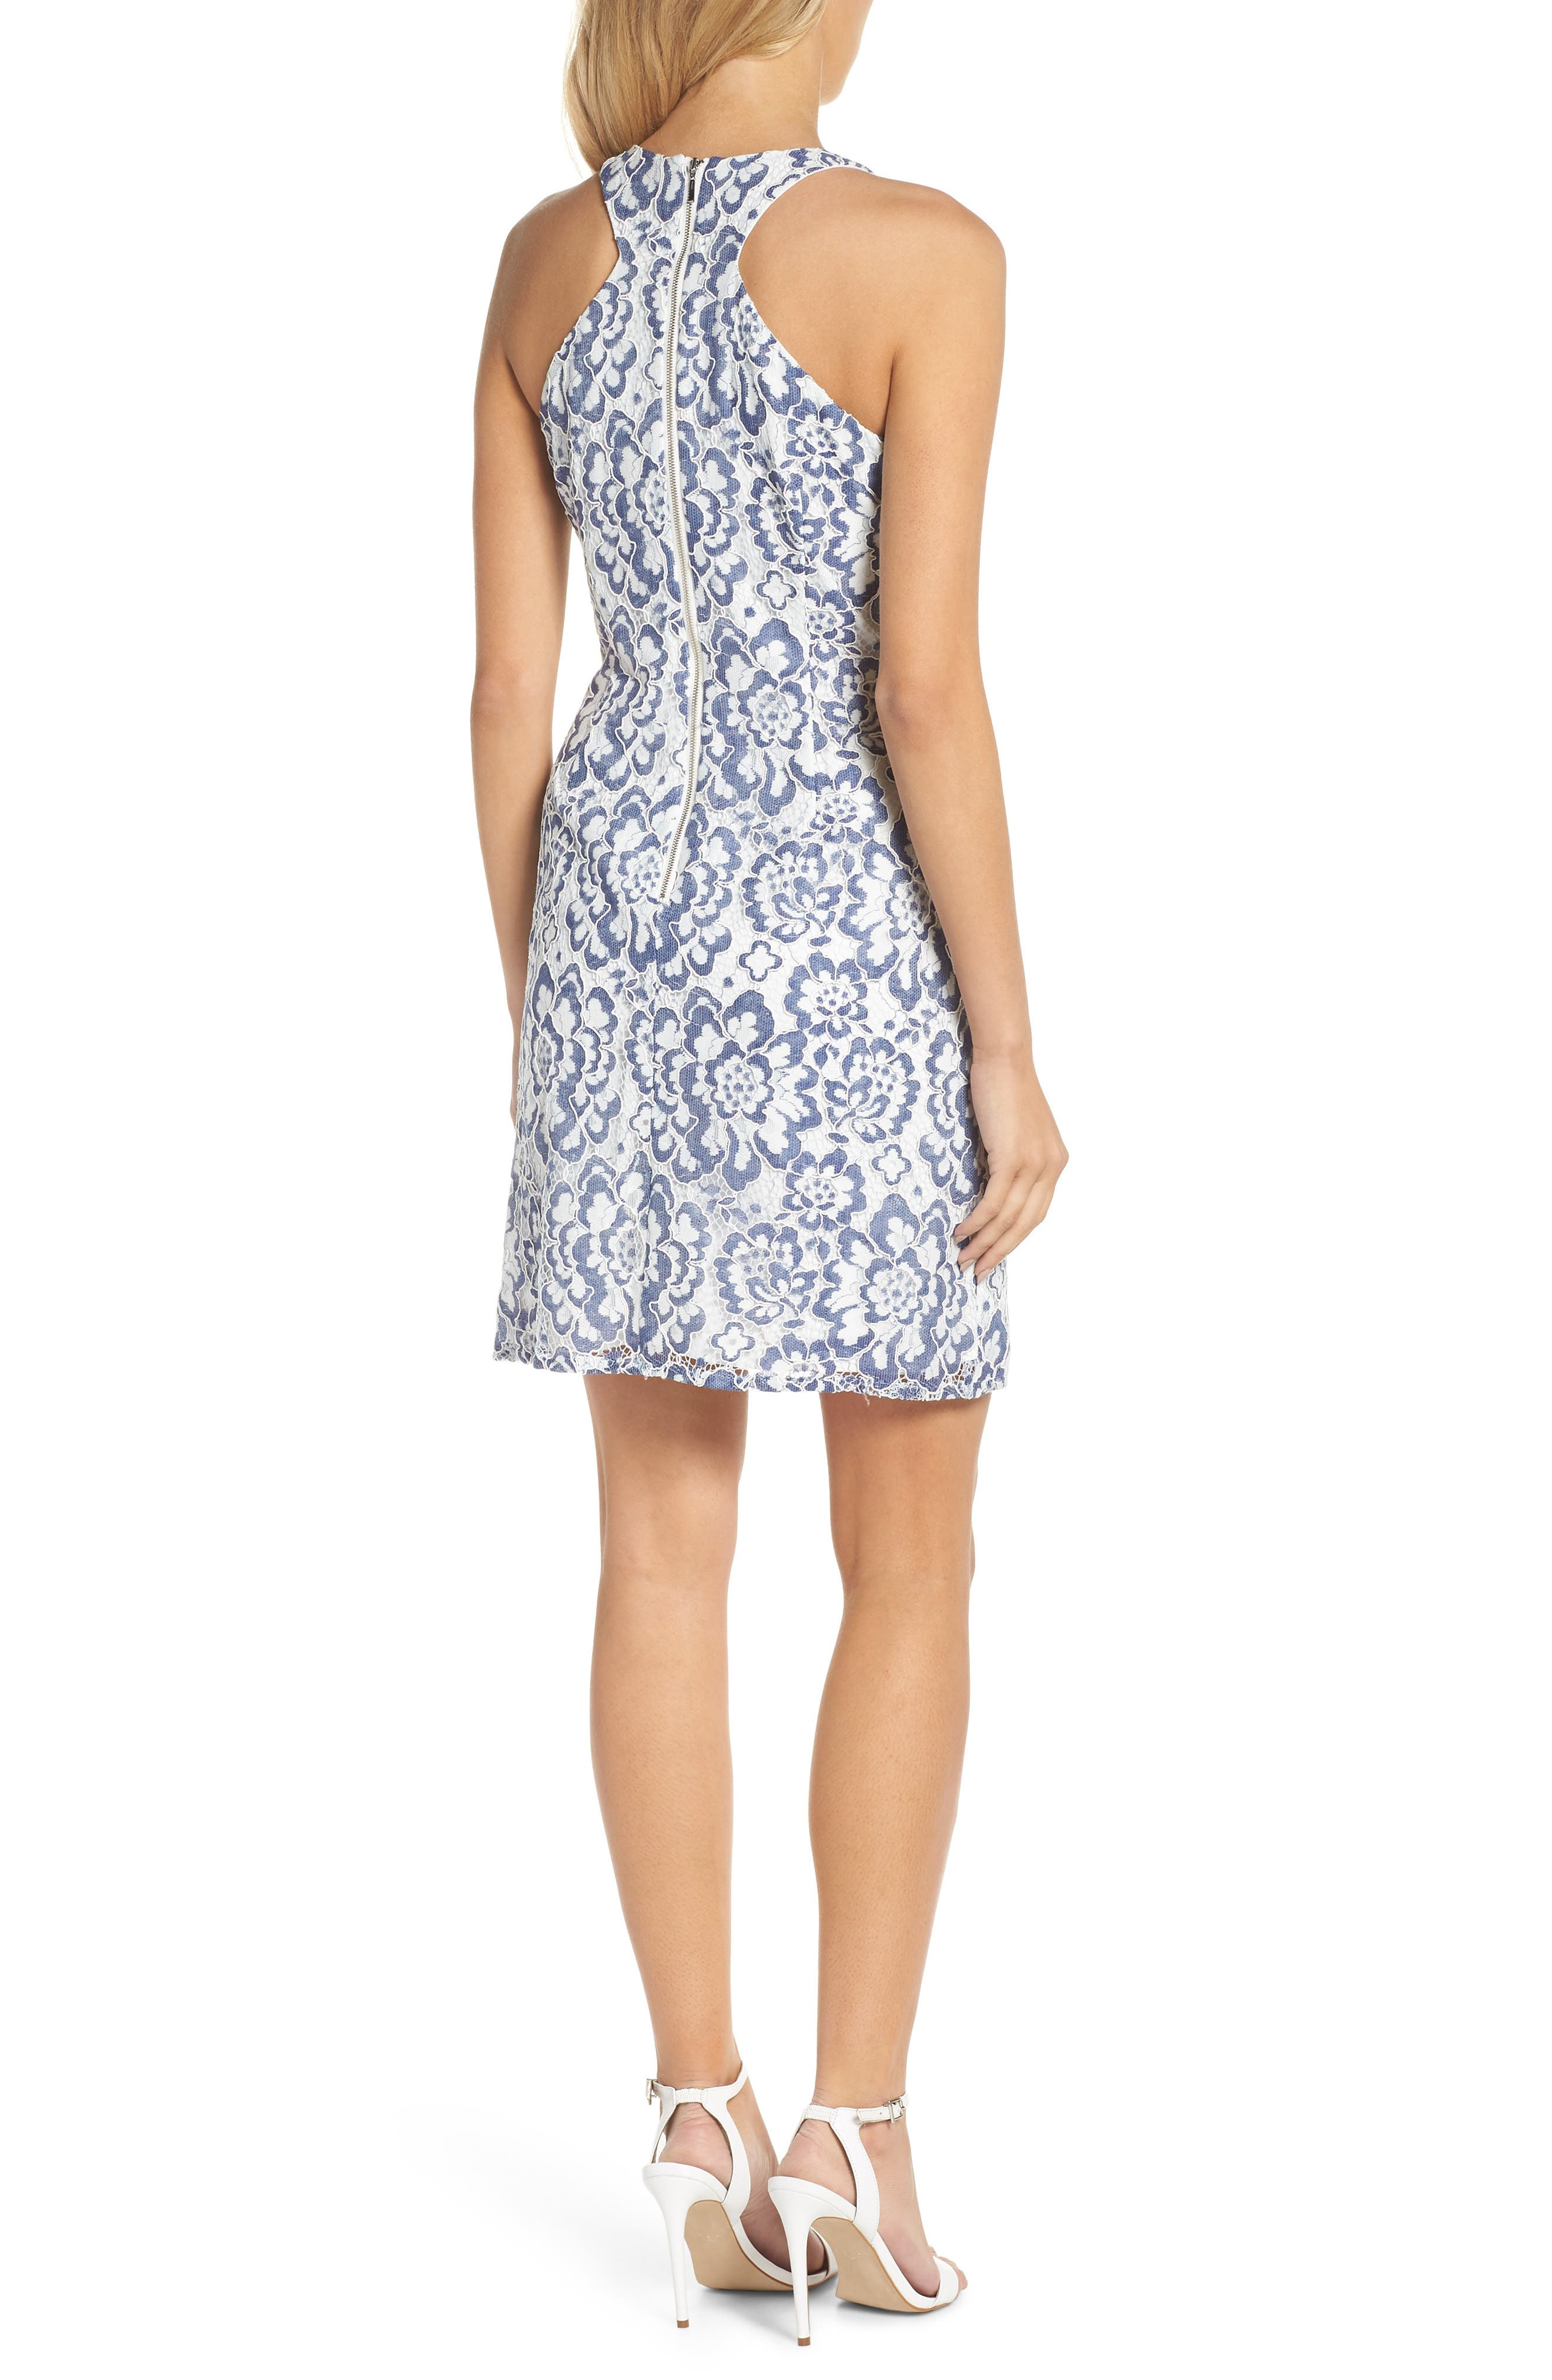 Elisa Two Tone Lace Sheath Dress,                             Alternate thumbnail 2, color,                             Blue/ White